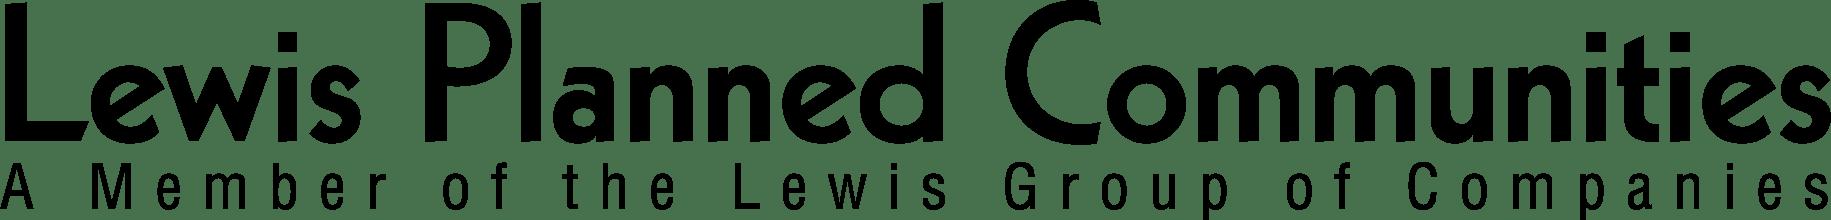 LewisPlannedCommunities[1](转换)